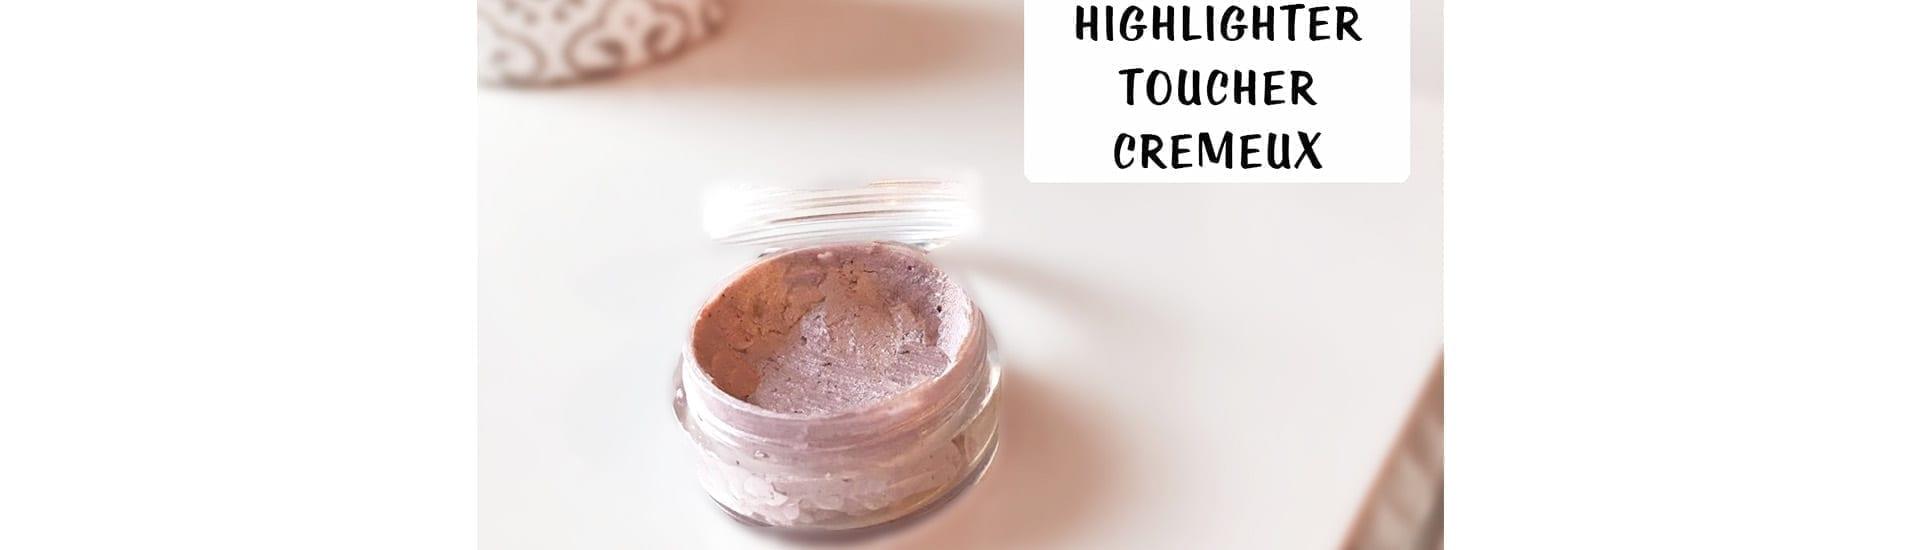 Highlighter de teint artisanal bio : toucher crémeux